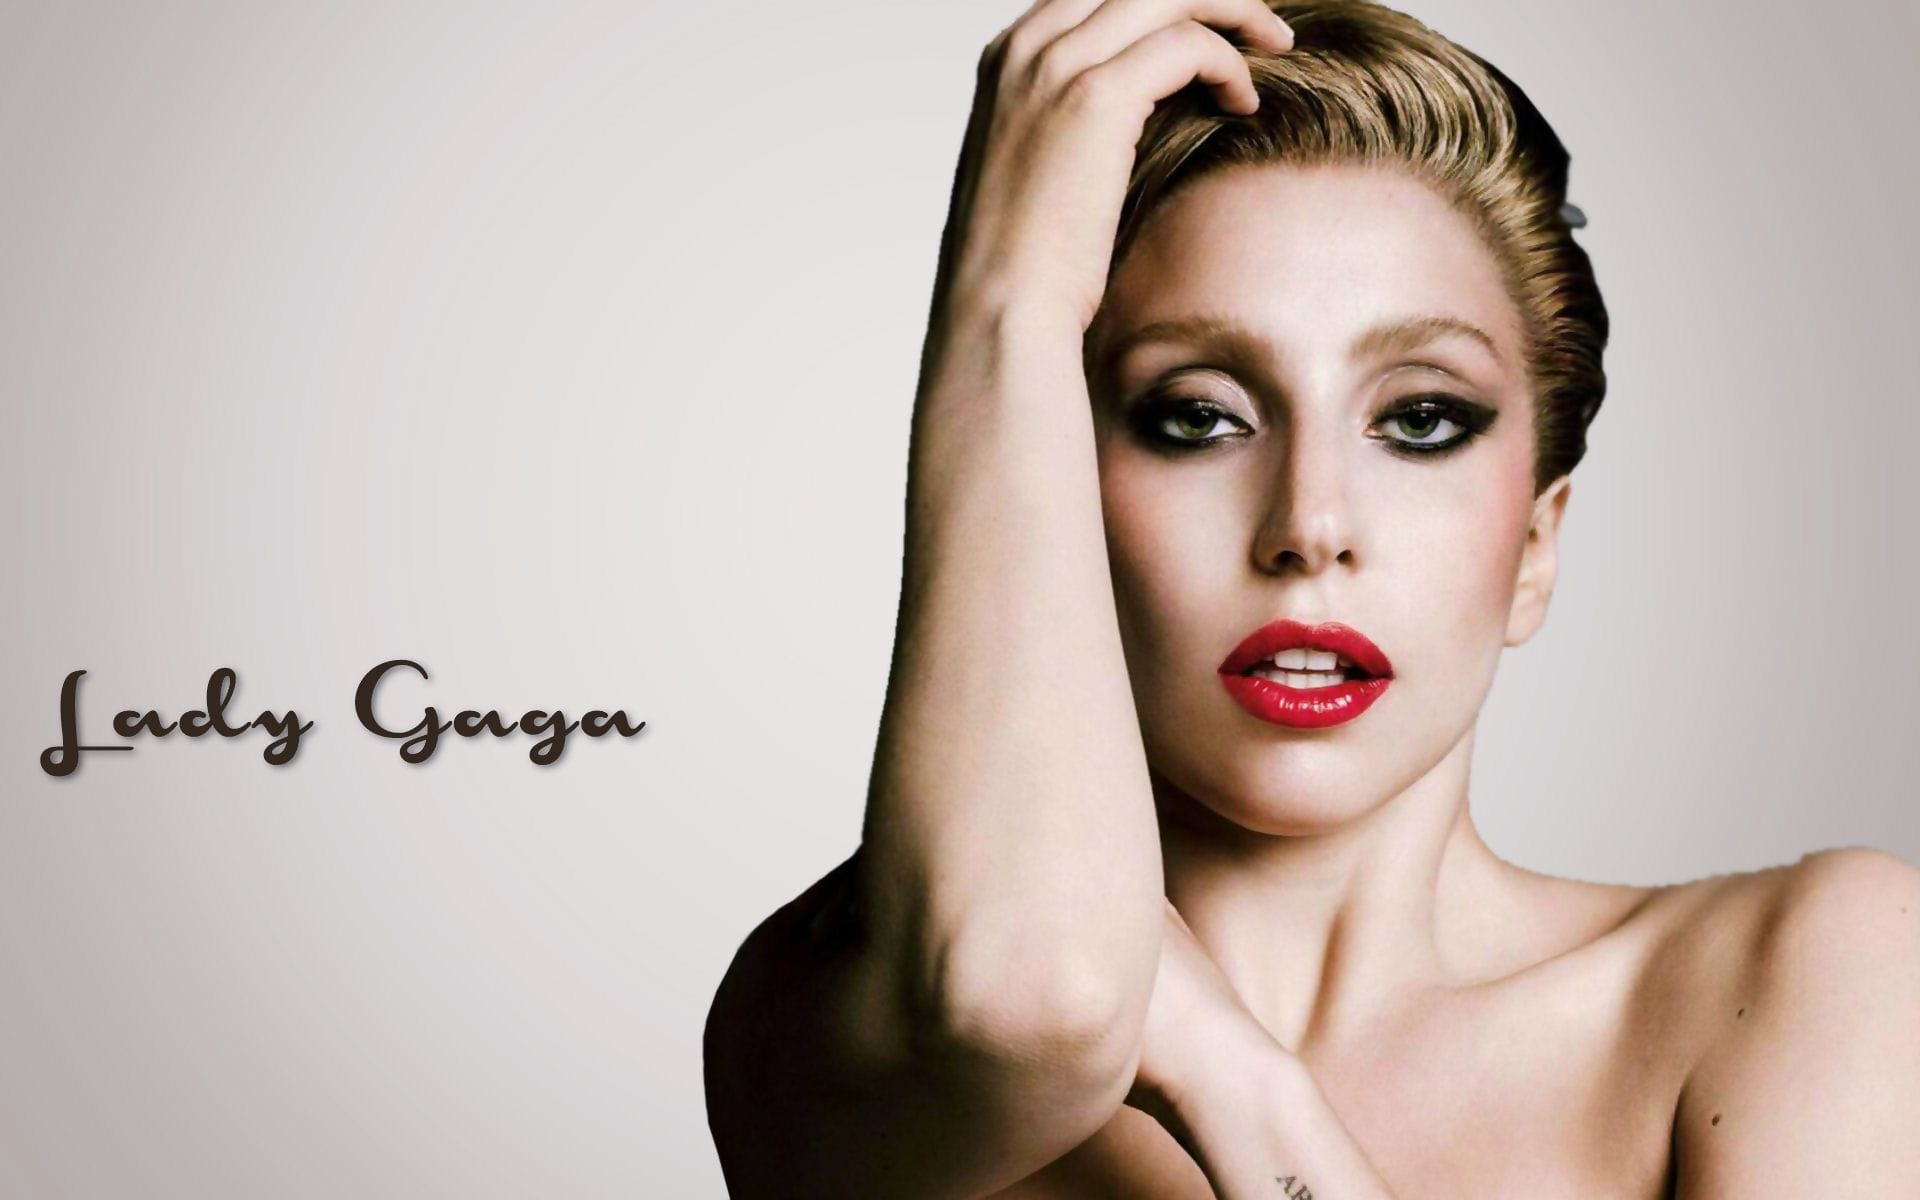 Lady Gaga HQ wallpapers